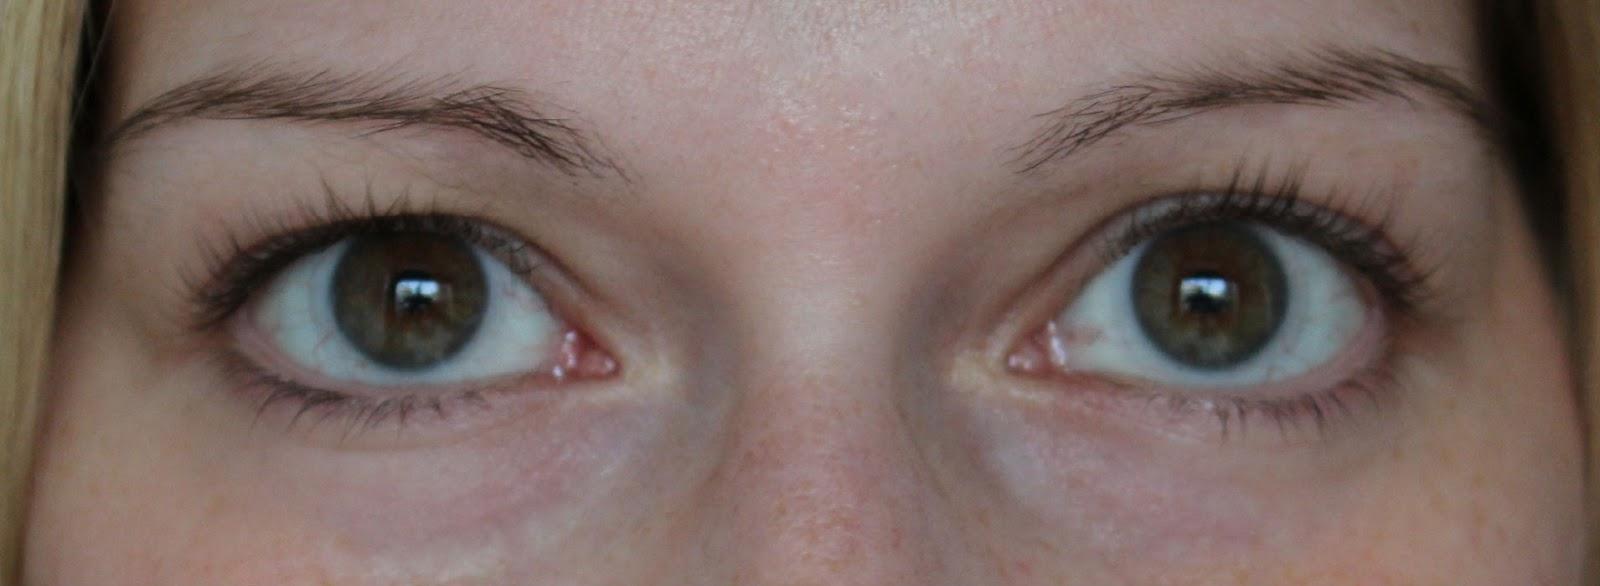 220ff1cba27 LashBlack} Semipermanente Mascara, die 3 Wochen hält - Kirschblütenblog